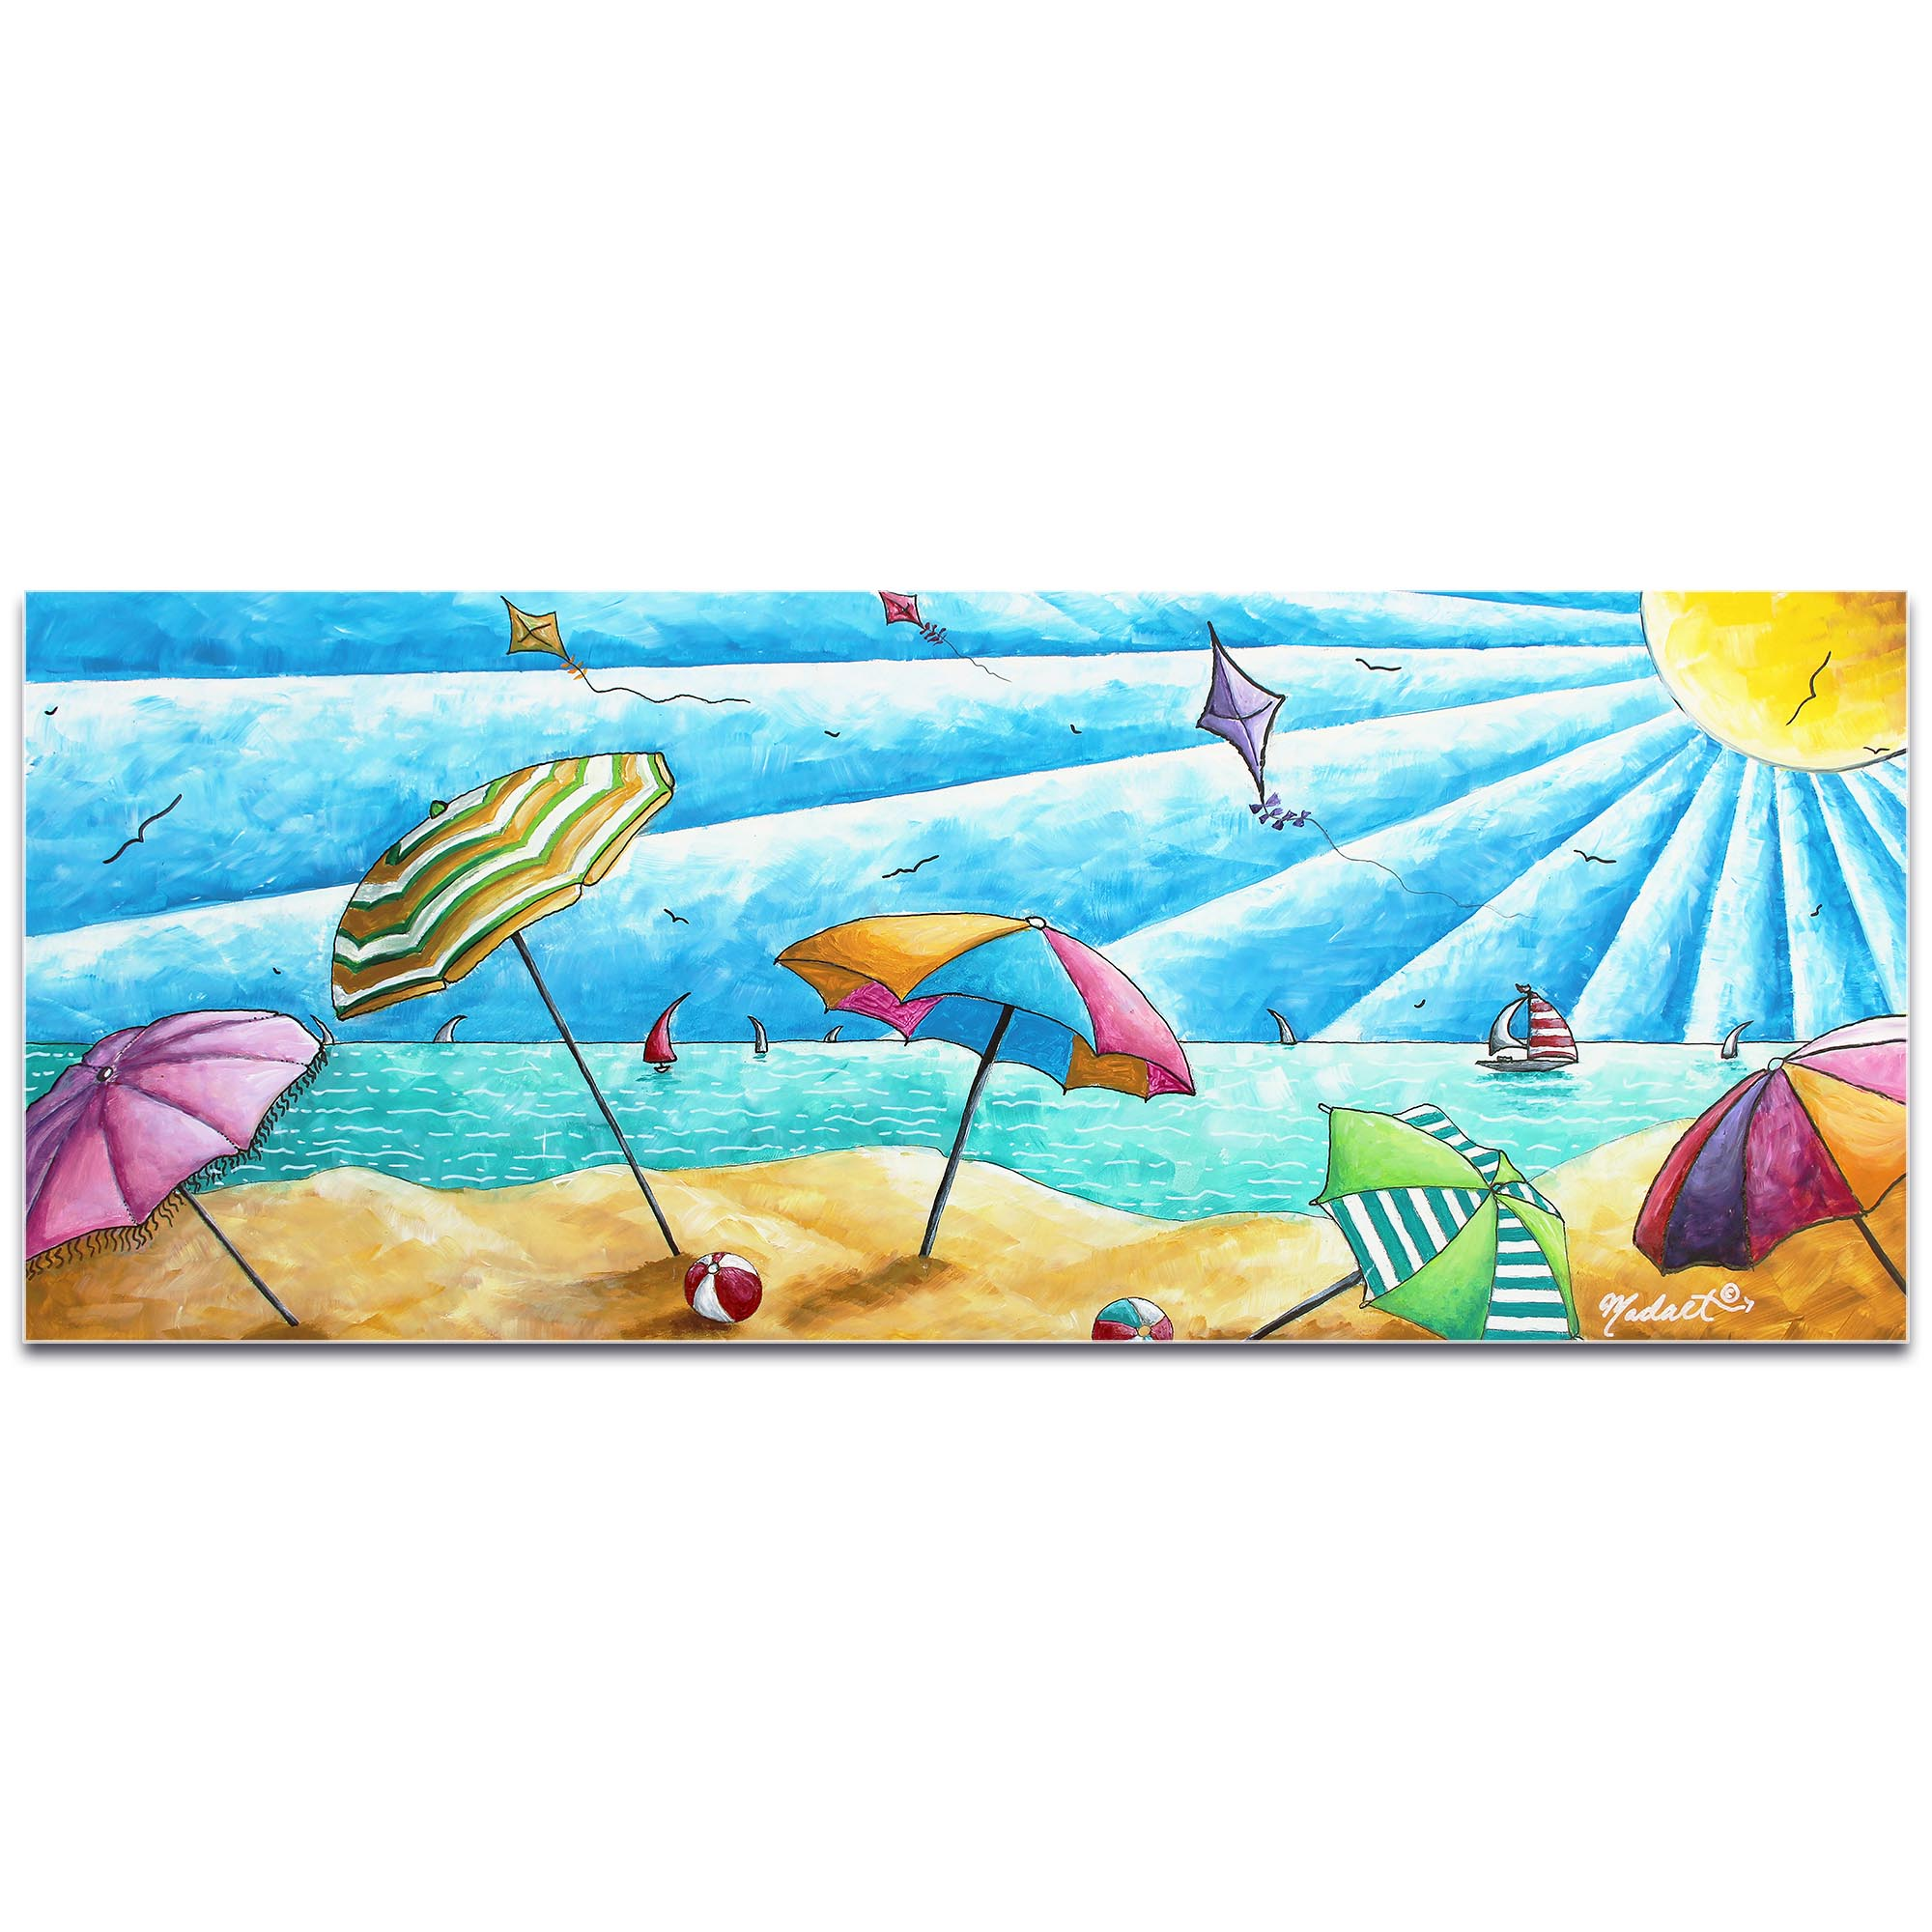 Beach Painting 'Beach Life v2' - Tropical Wall Art on Metal or Acrylic - Image 2